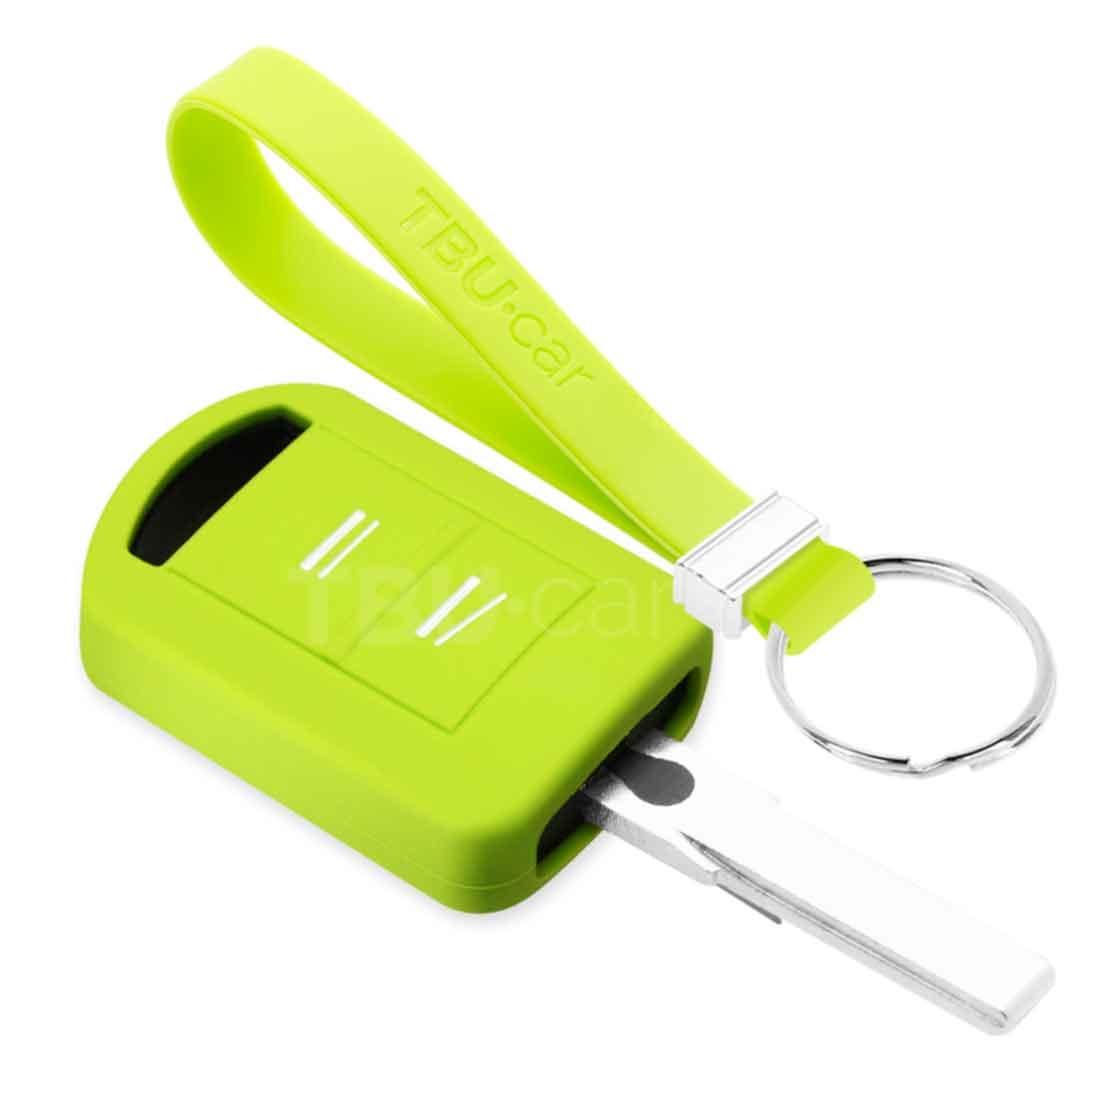 TBU car TBU car Sleutel cover compatibel met Vauxhall - Silicone sleutelhoesje - beschermhoesje autosleutel - Lime groen